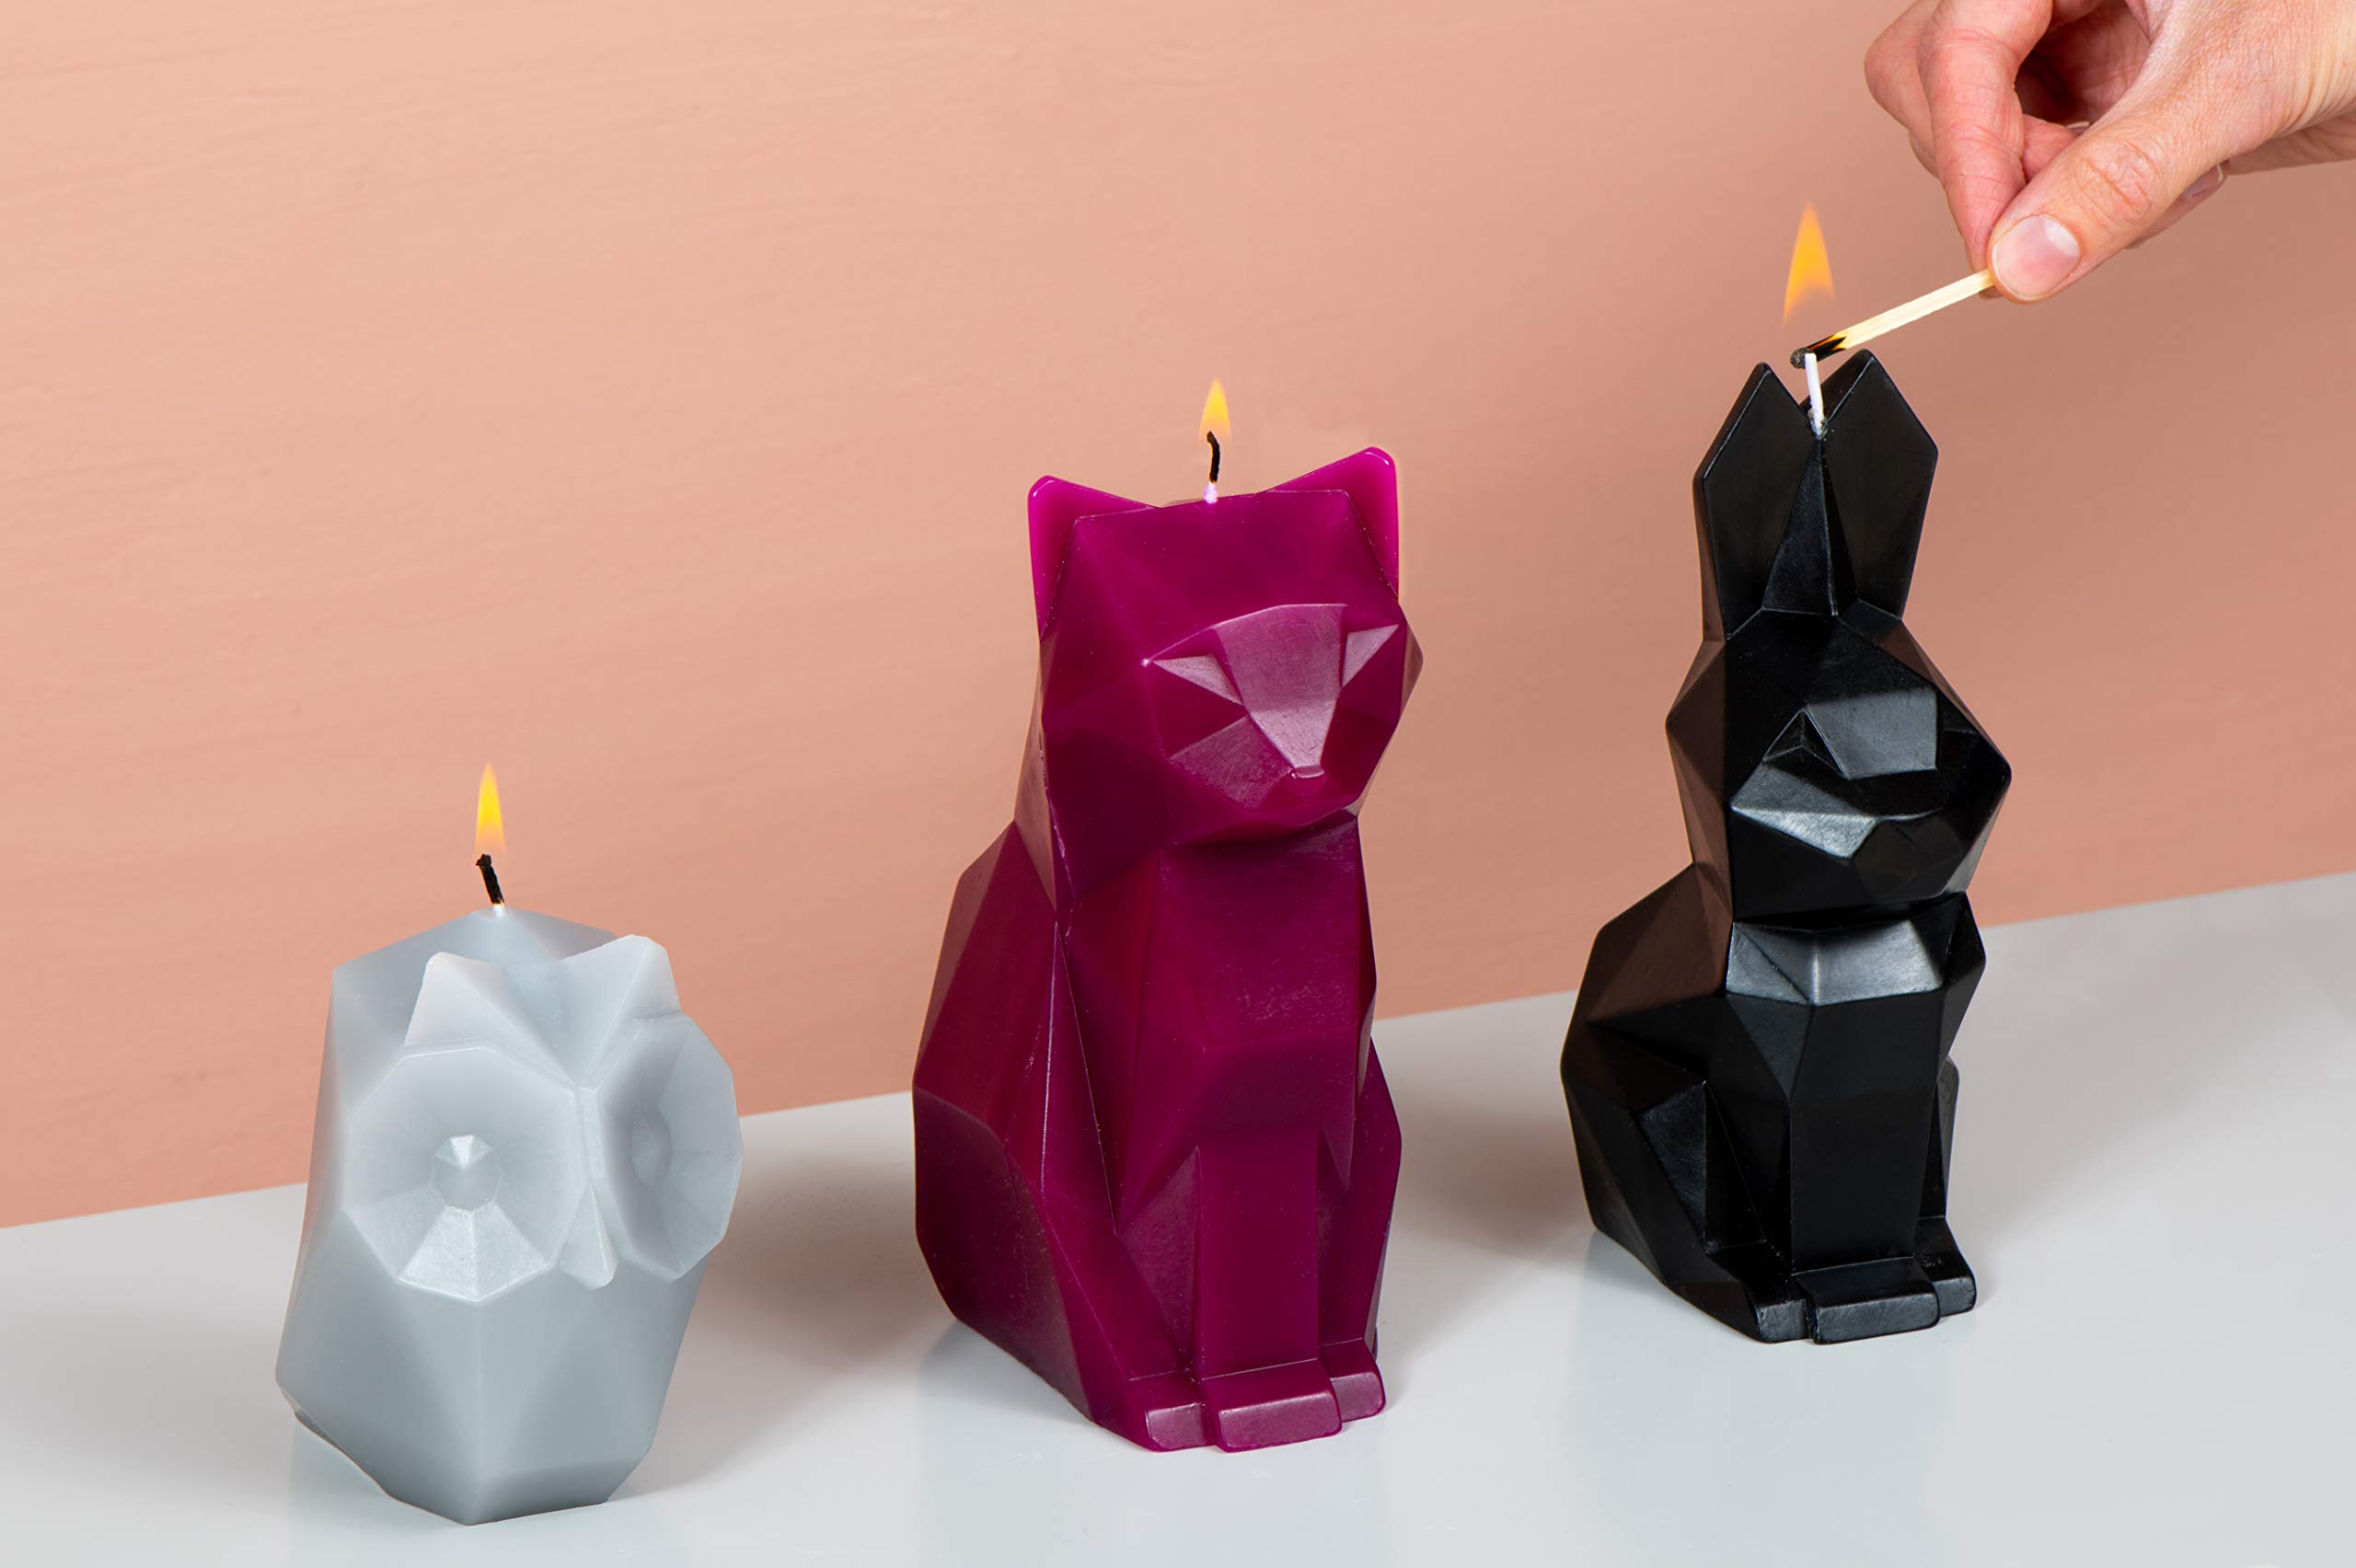 PyroPet Candles, Ugla Owl Wax Candle, Melts to Metallic Skeleton (Cool  Grey)- Buy Online in Botswana at botswana.desertcart.com. ProductId :  57645078.